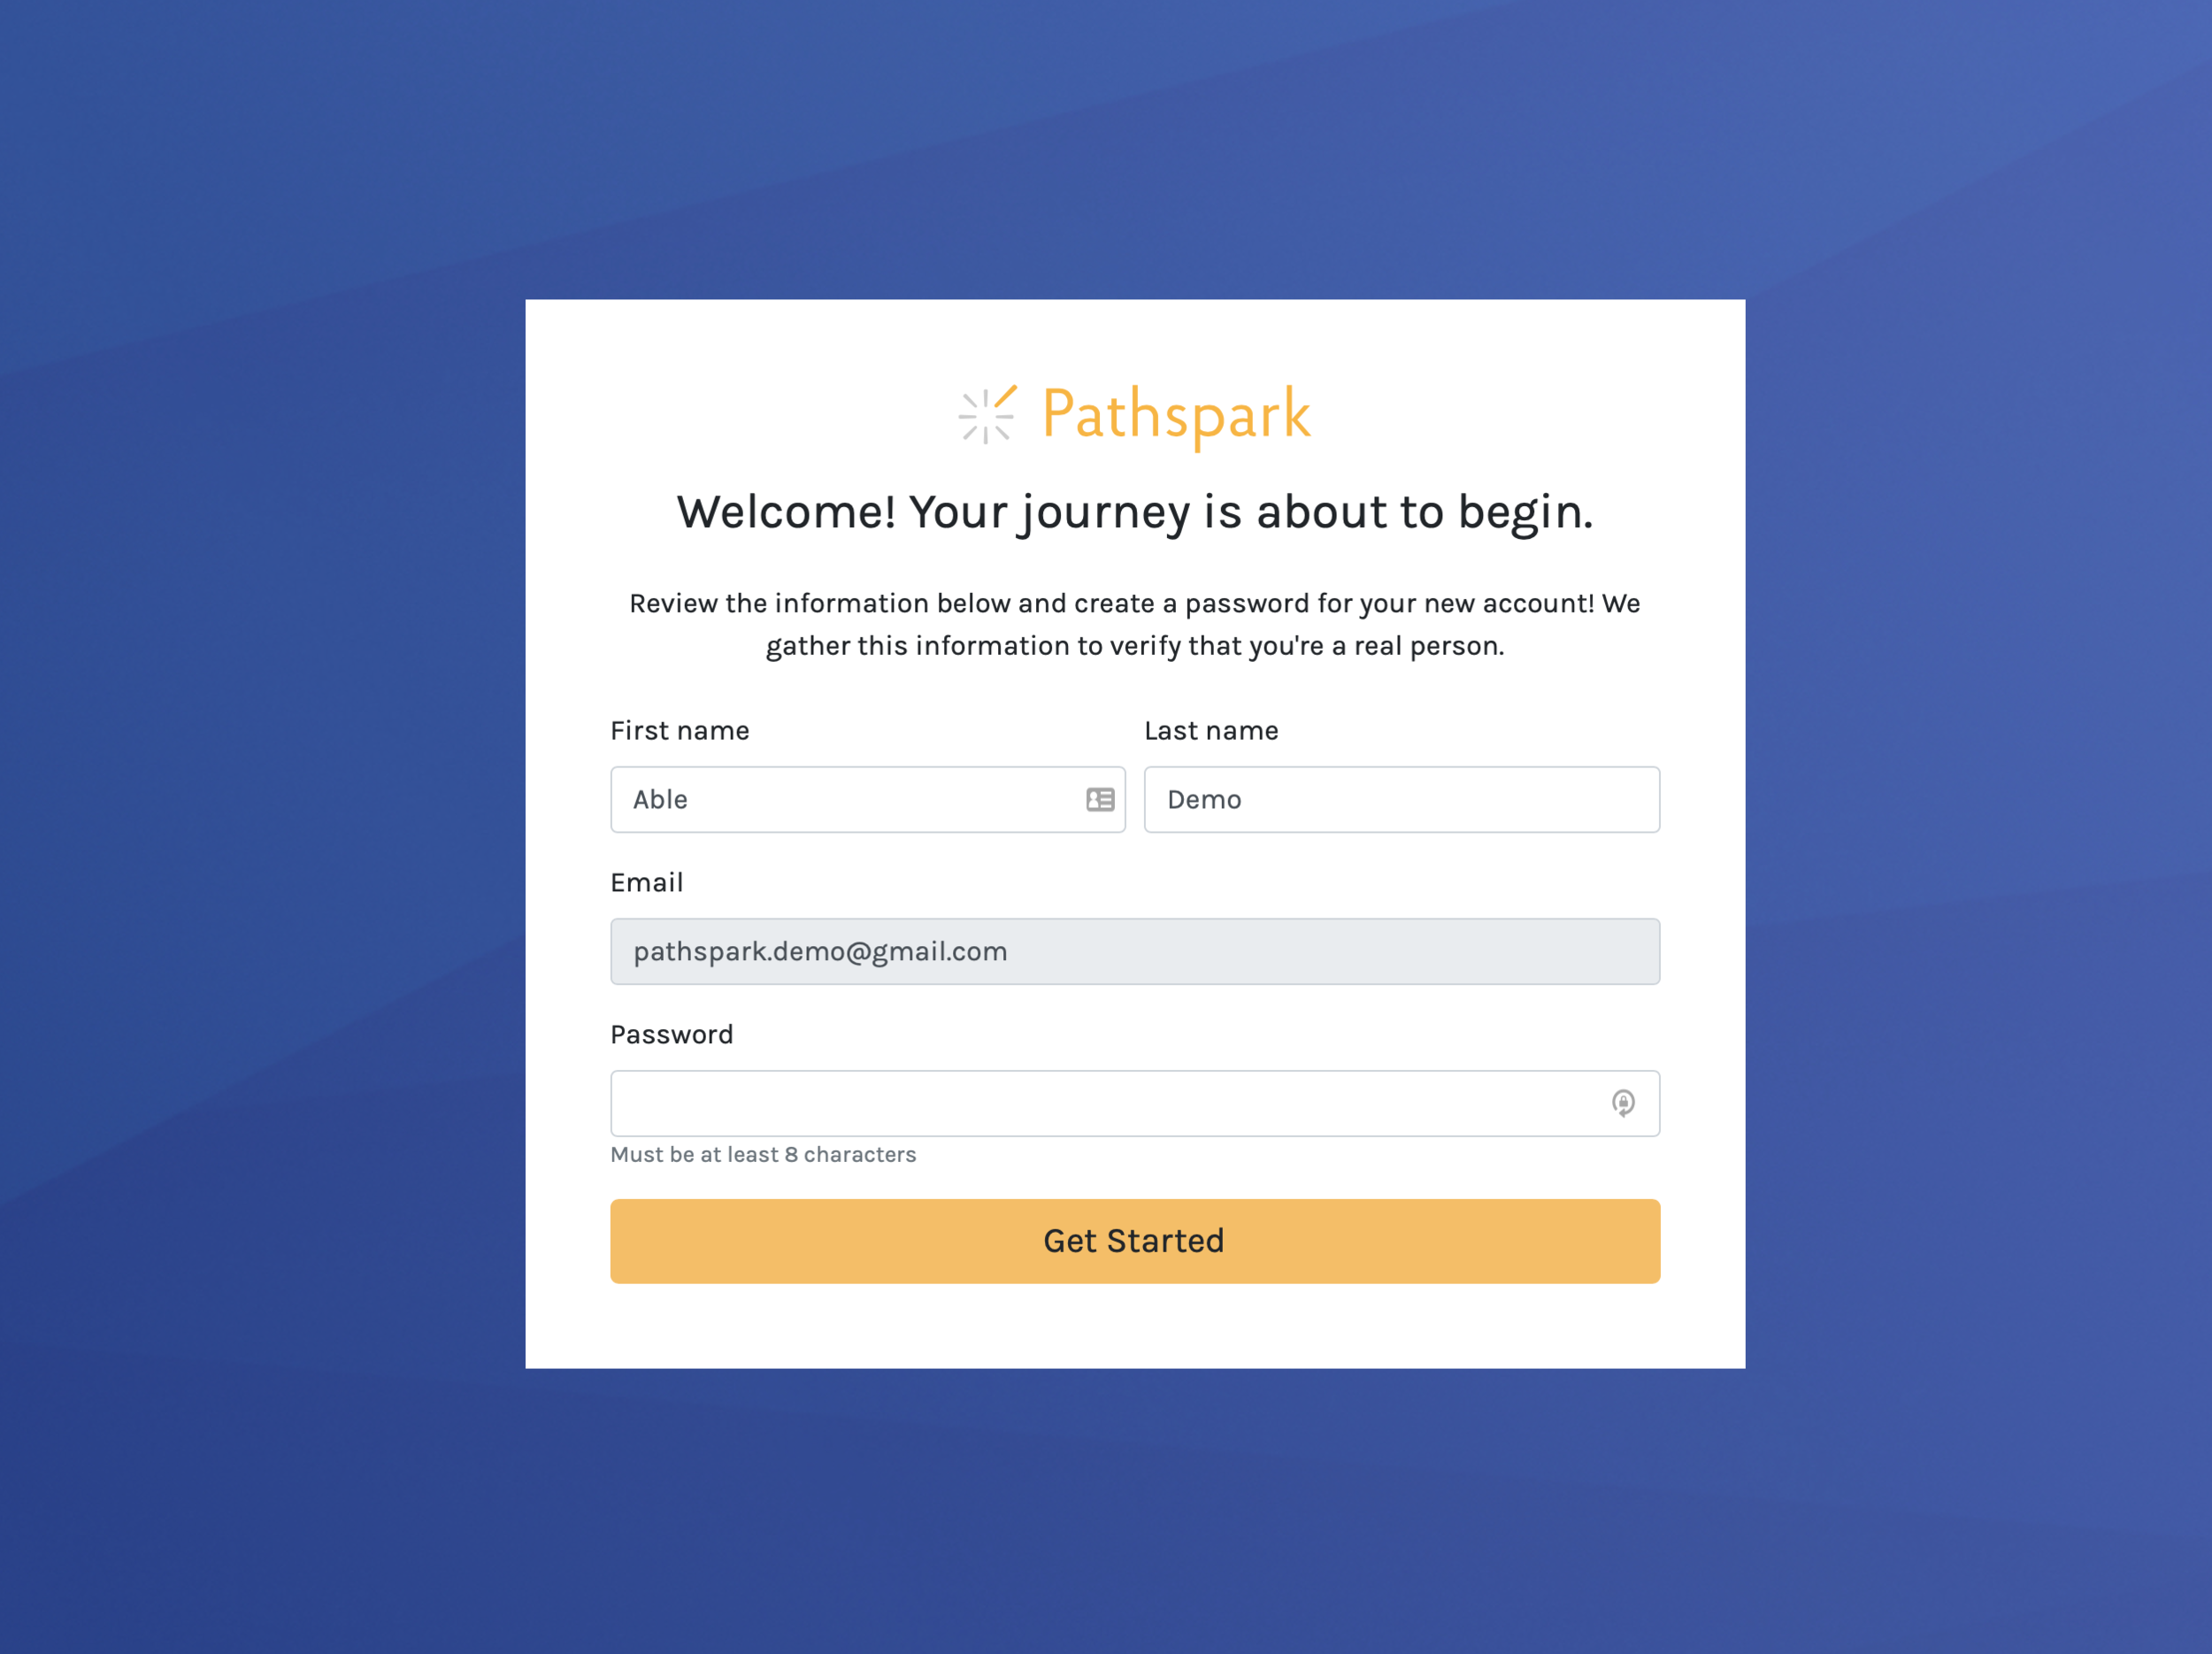 Pathspark_12_seconds.png